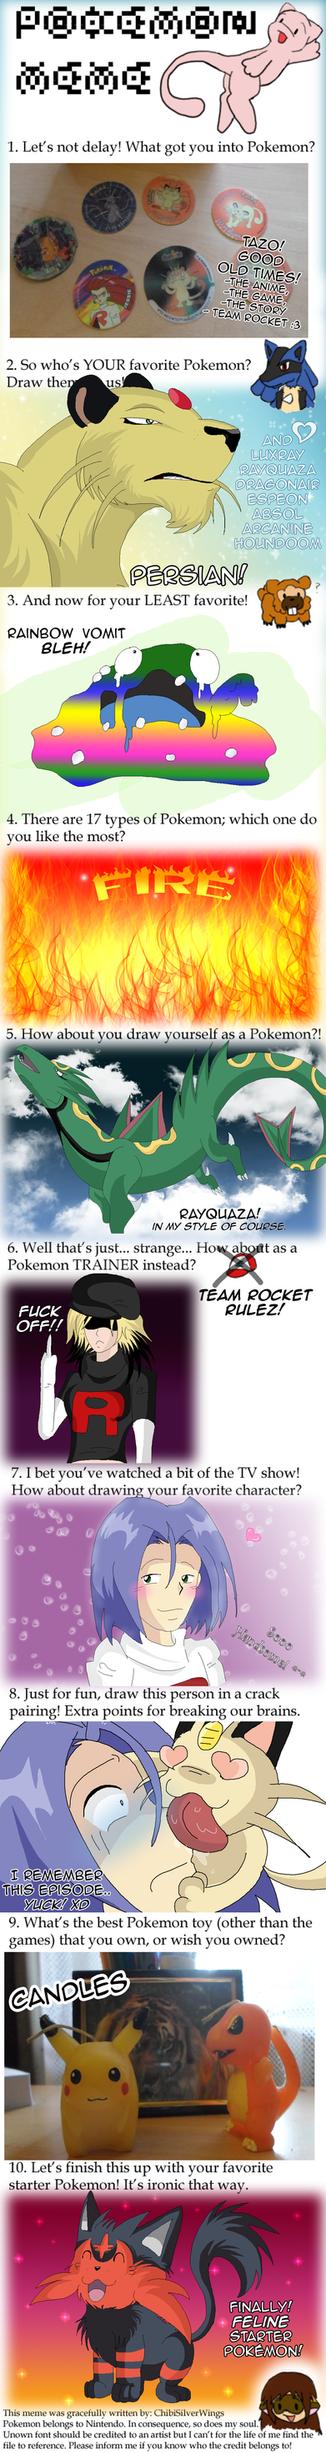 Pokemon Meme by KillerSandy